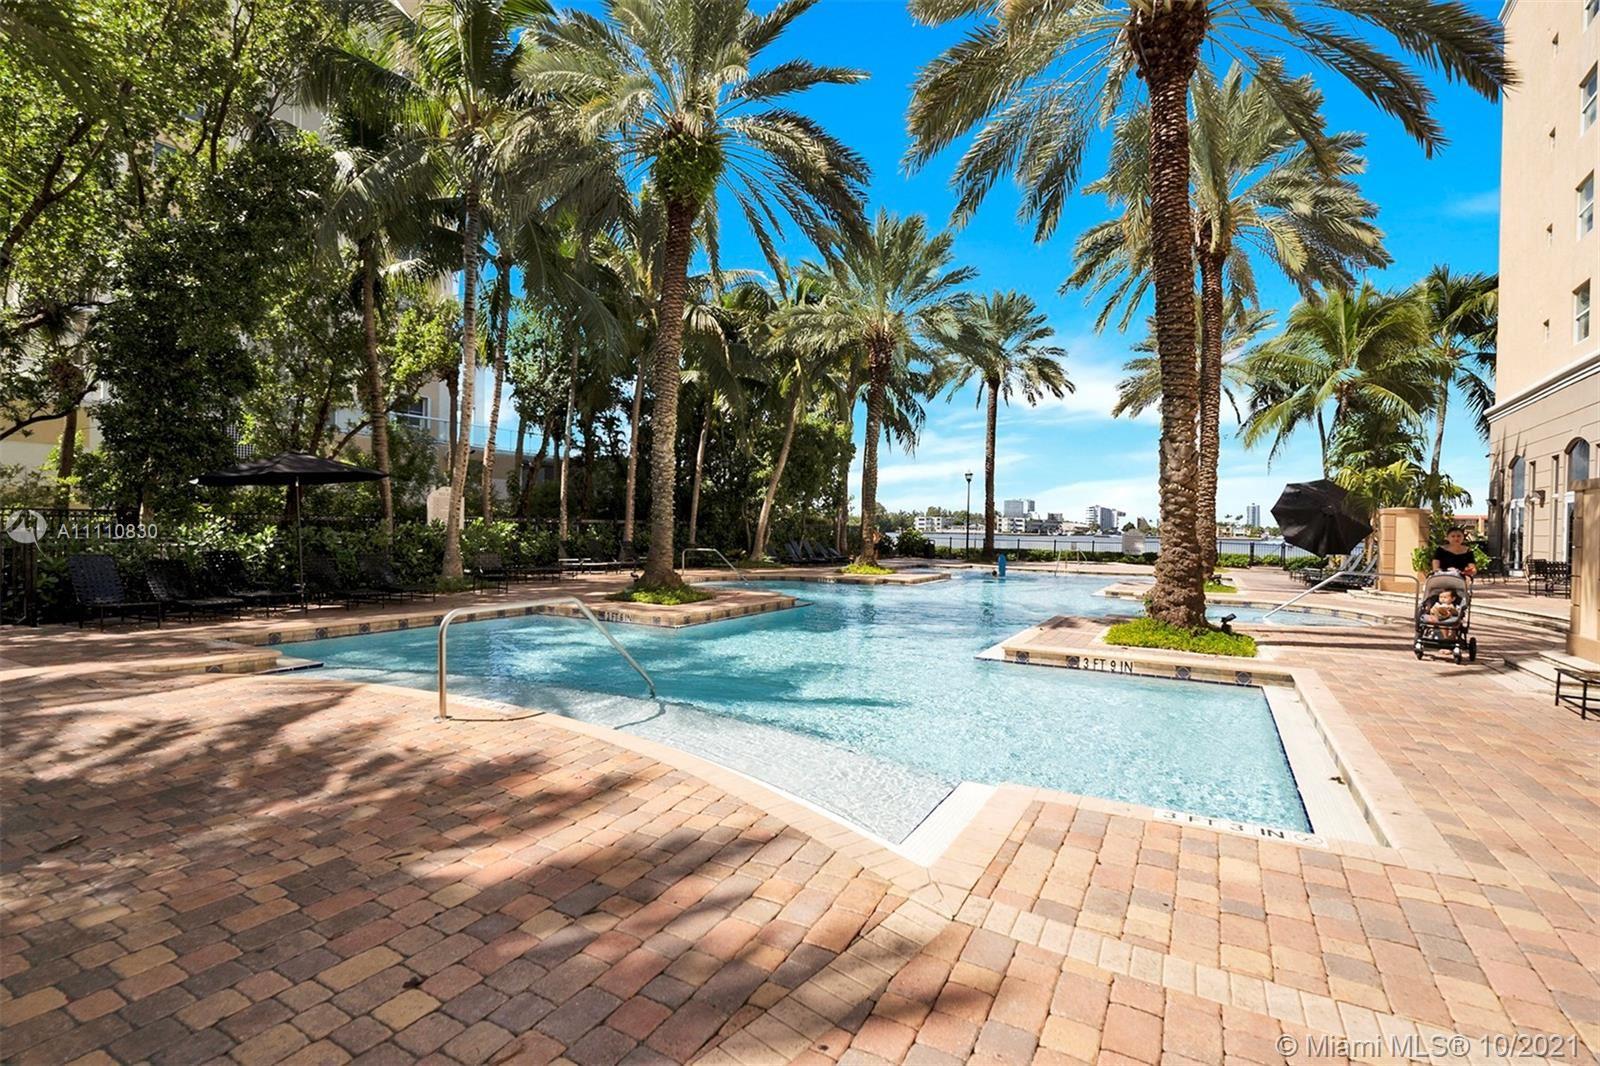 Photo of 17145 N Bay Rd #4509, Sunny Isles Beach, FL 33160 (MLS # A11110830)